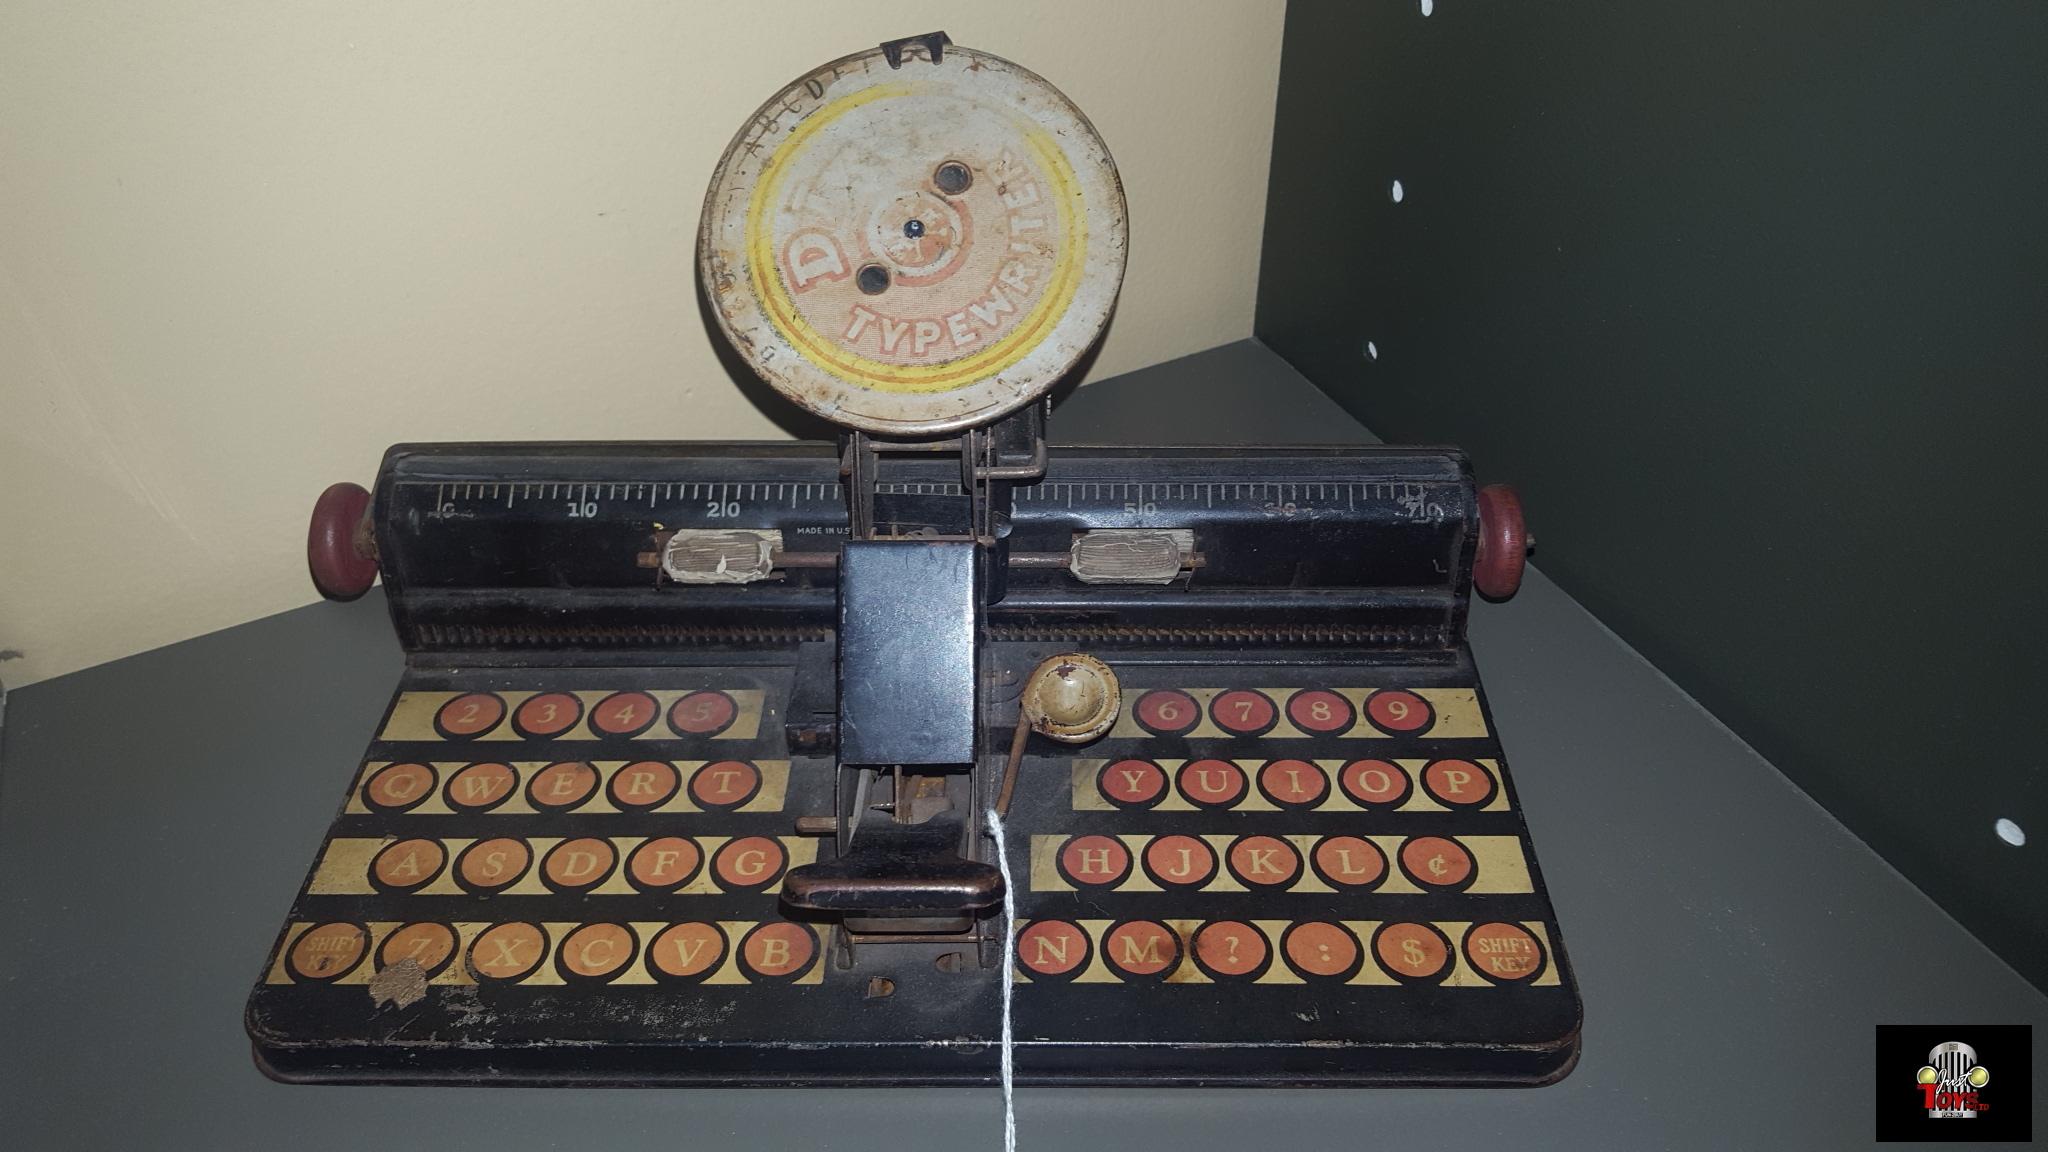 Childrens Typewriter